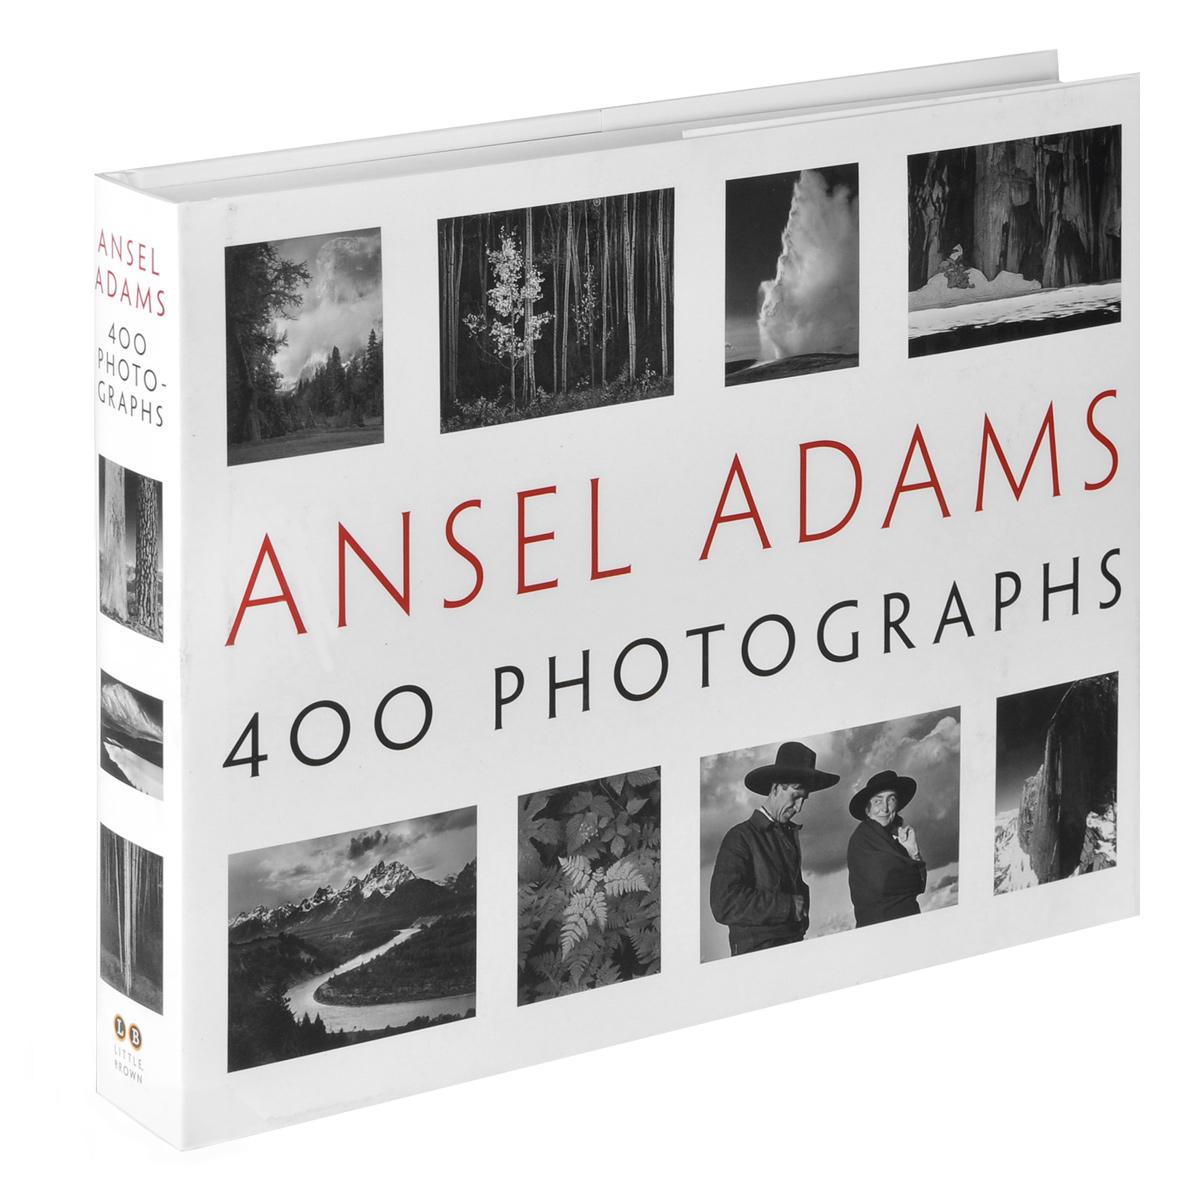 Ansel Adams Ansel Adams: 400 Photographs